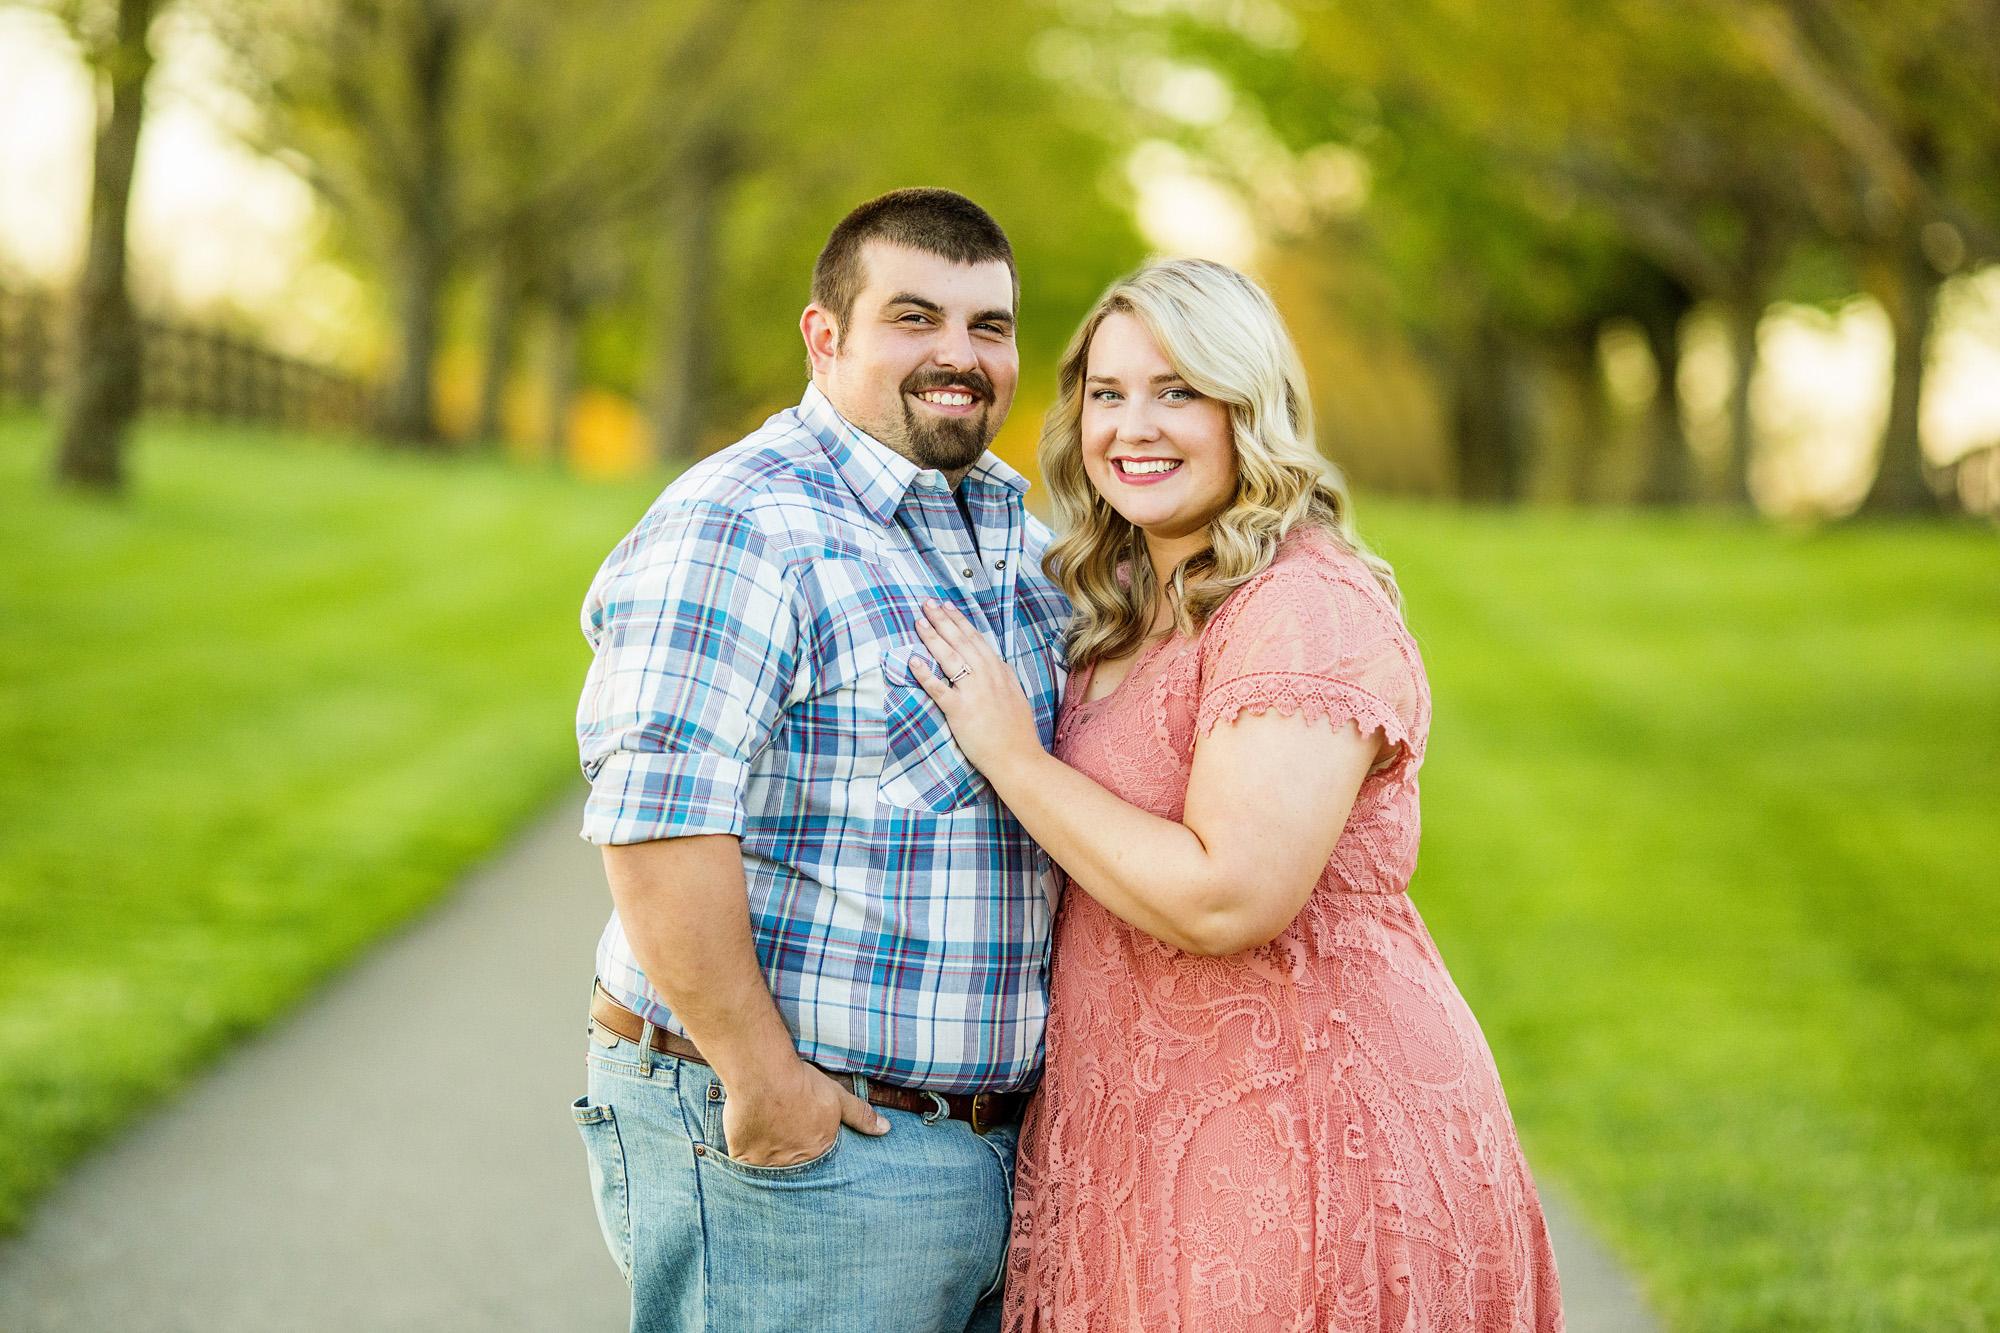 Seriously_Sabrina_Photography_Lexington_Kentucky_Sunset_Farm_Engagement_Cody_Sara_37.jpg